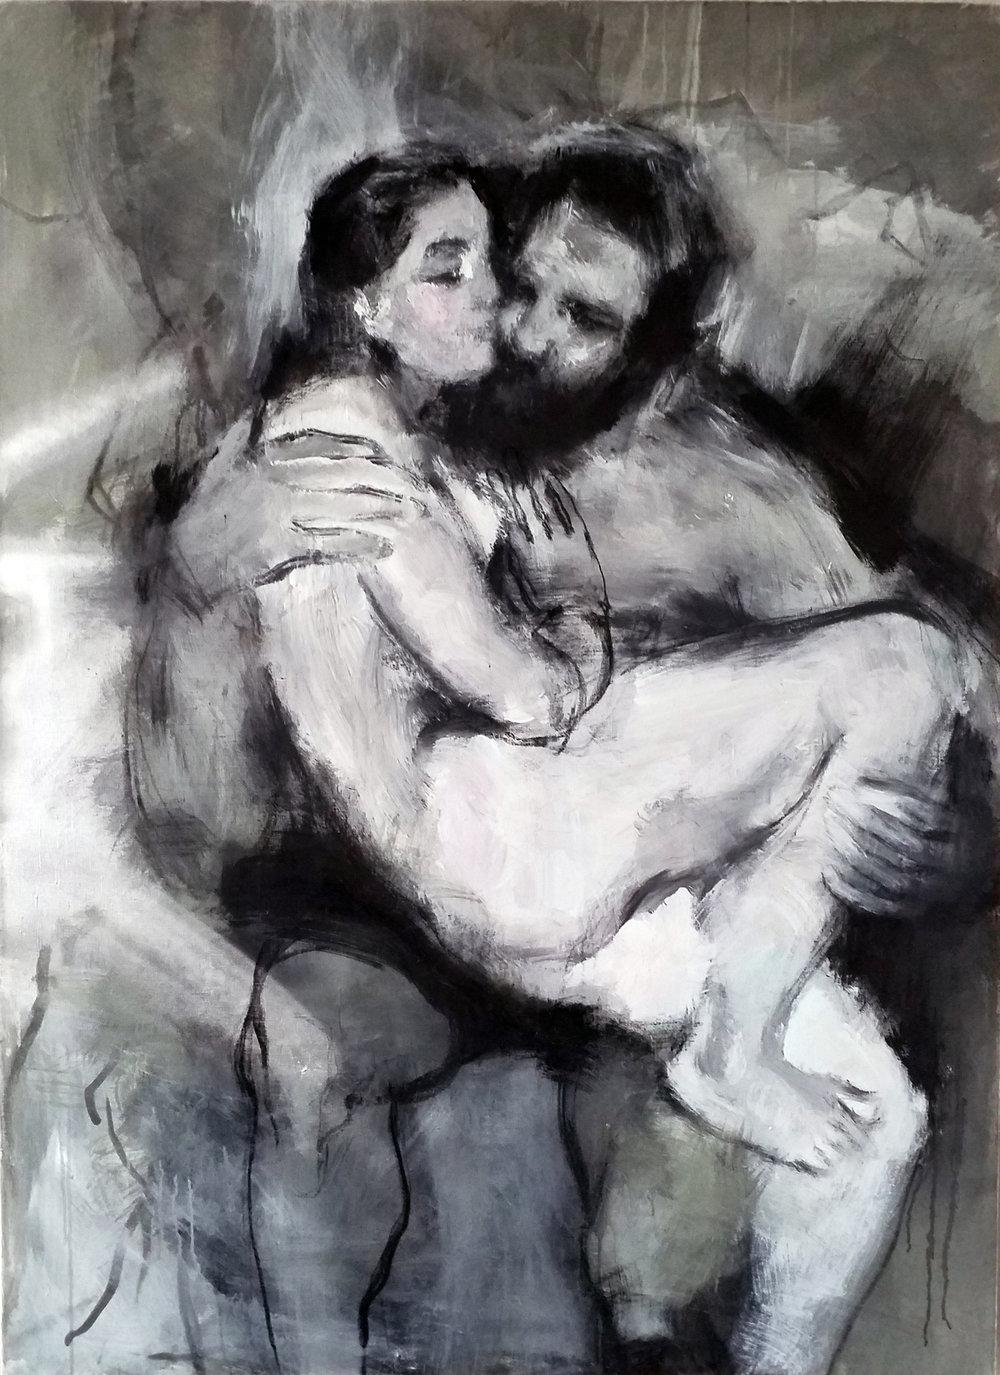 Lovers III, 150 x 100 cm, mixed media on canvas, 2018